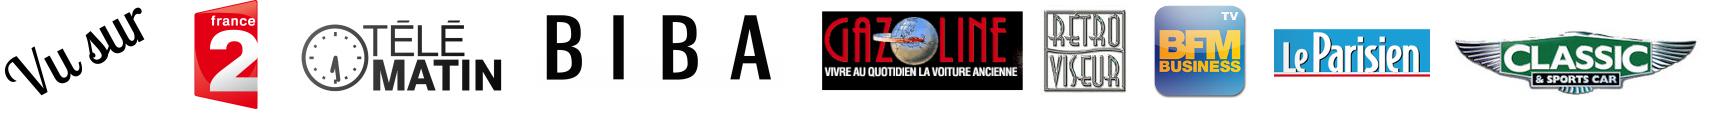 Logo France2 Telematin Biba Gazoline